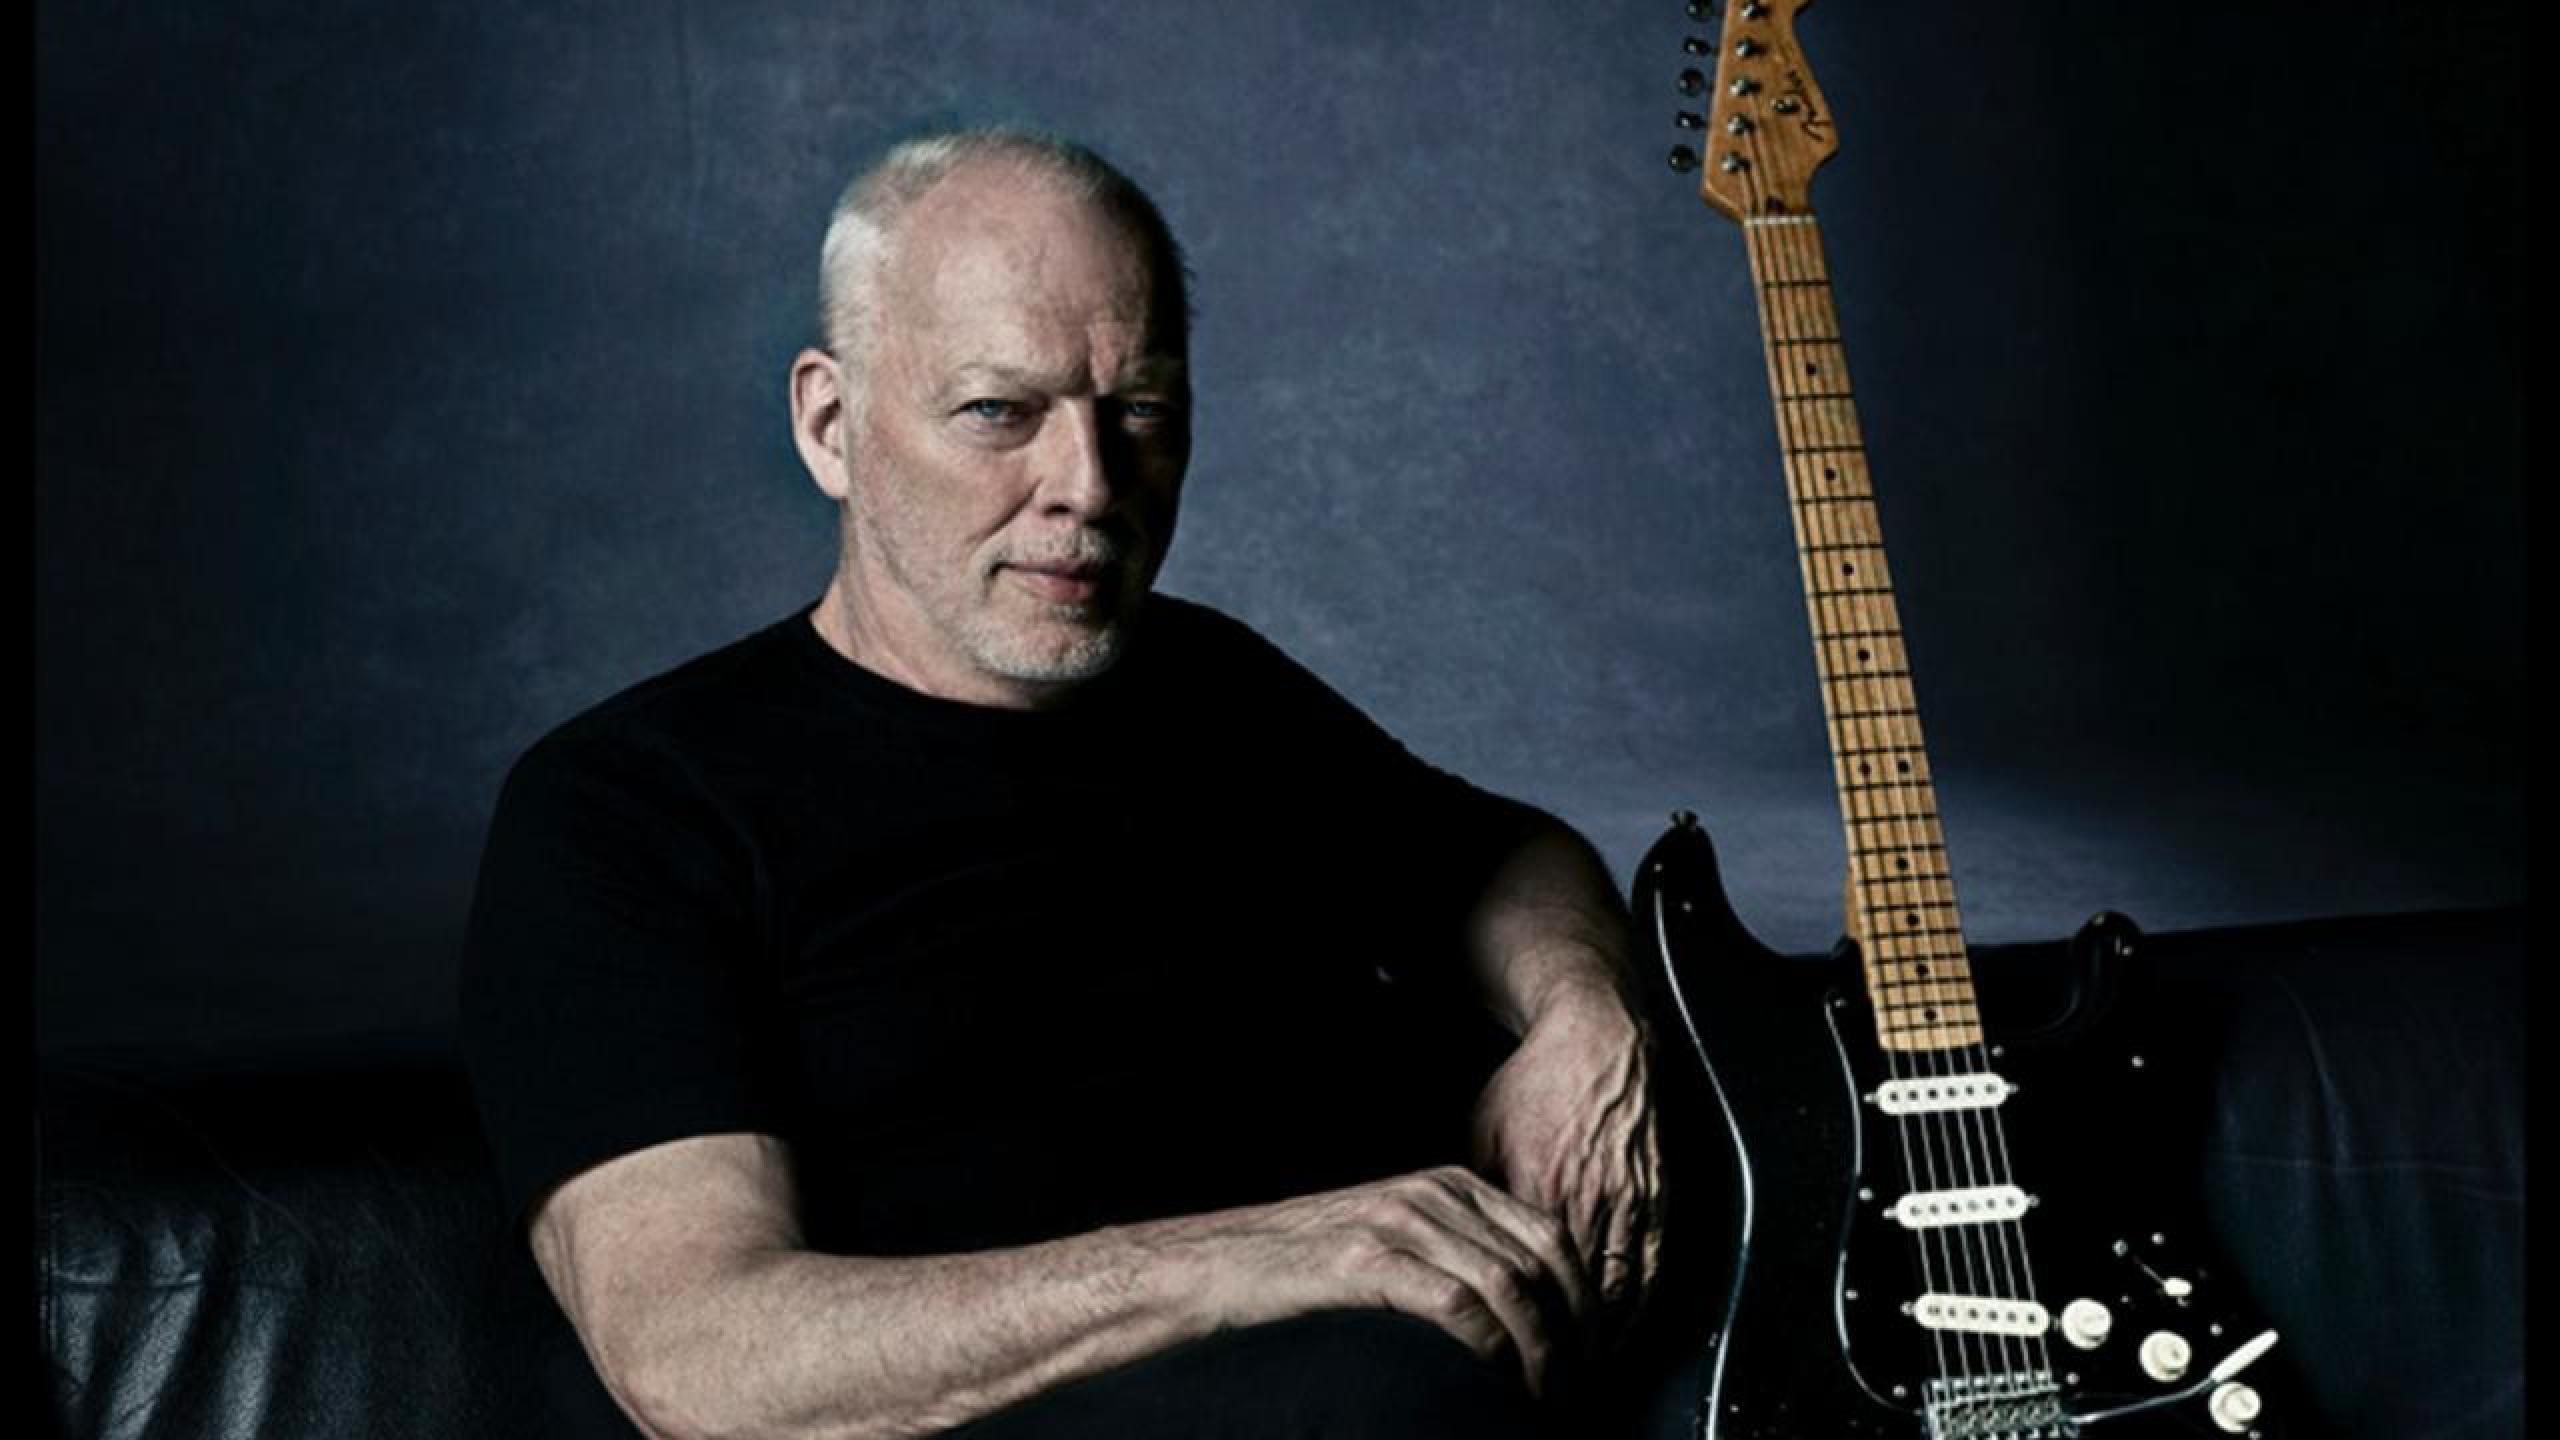 David Gilmour Tour 2020.David Gilmour Tour Dates 2019 2020 David Gilmour Tickets